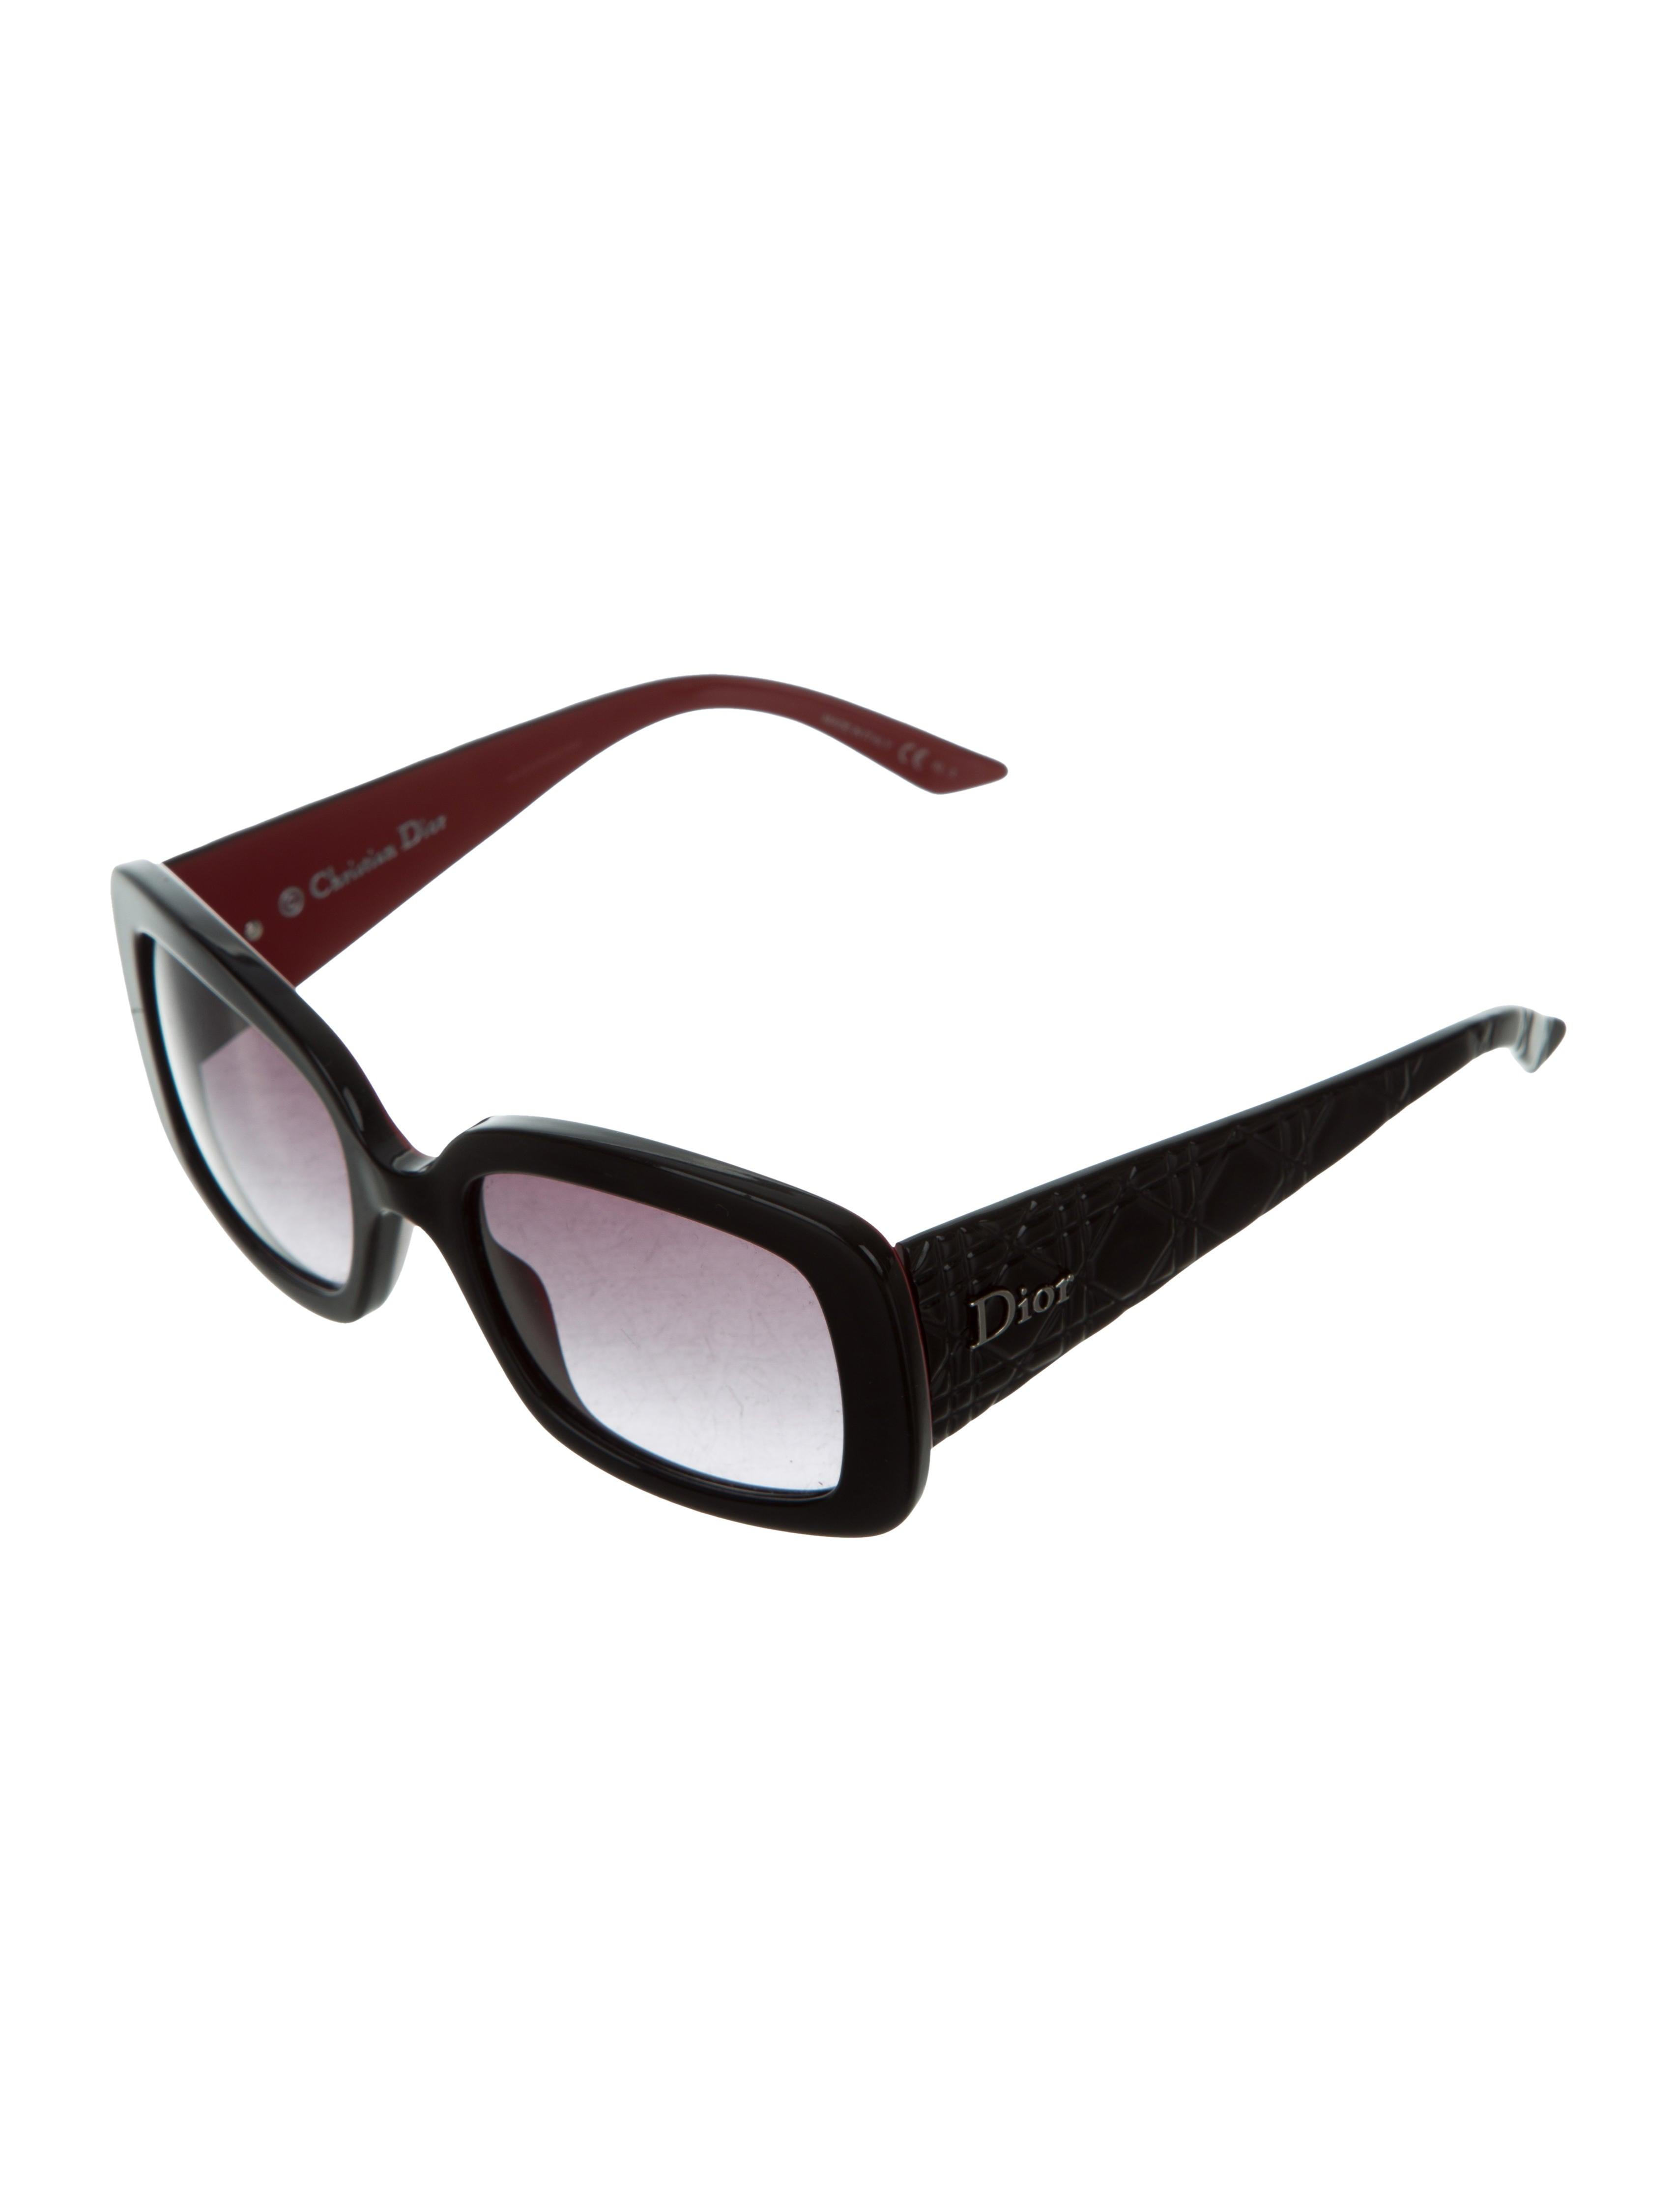 e819e025c4f Christian Dior Lady Lady 2 Sunglasses - Accessories - CHR59016